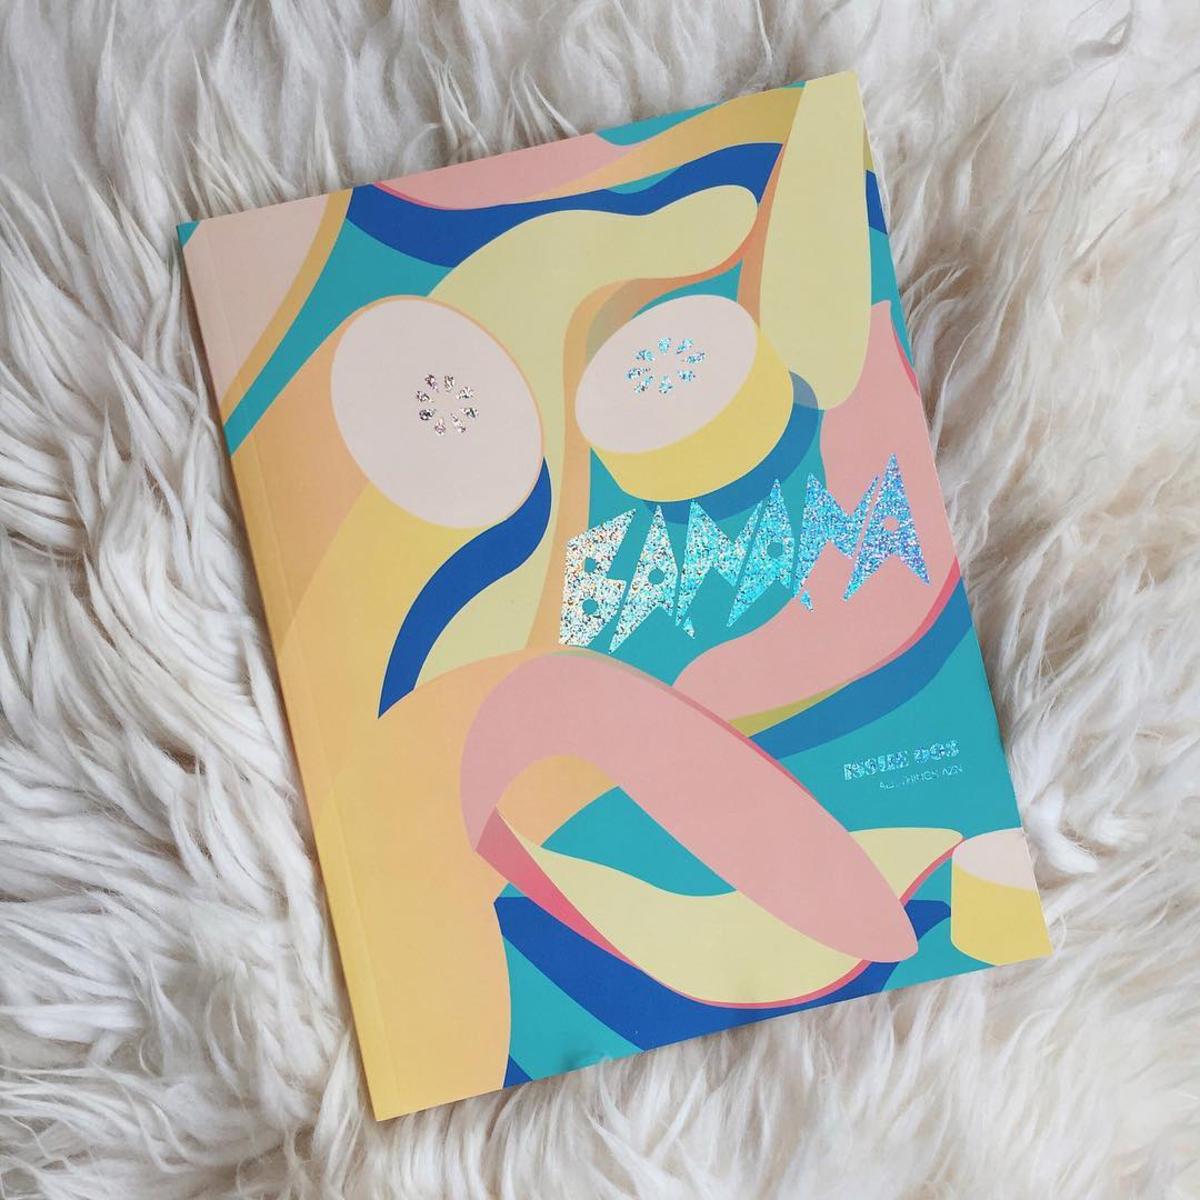 """Banana"" Magazine's Issue 3. Photo: @bananamag/Instagram"